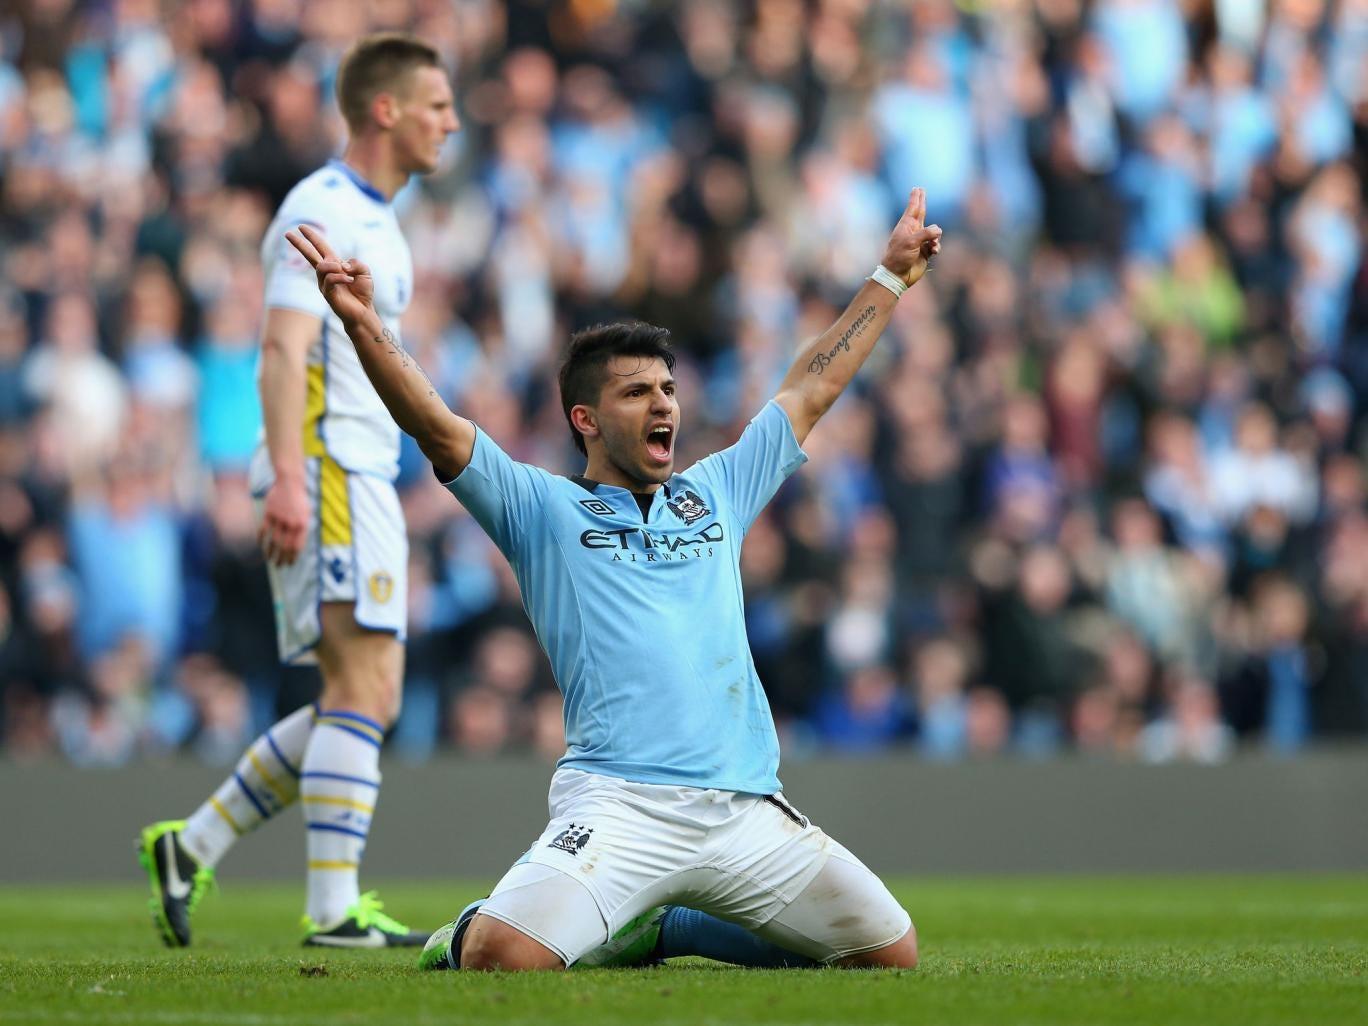 <b>Man City 4-0 Leeds United</b><br/>Sergio Aguero of Manchester City celebrates scoring his team's fourth goal